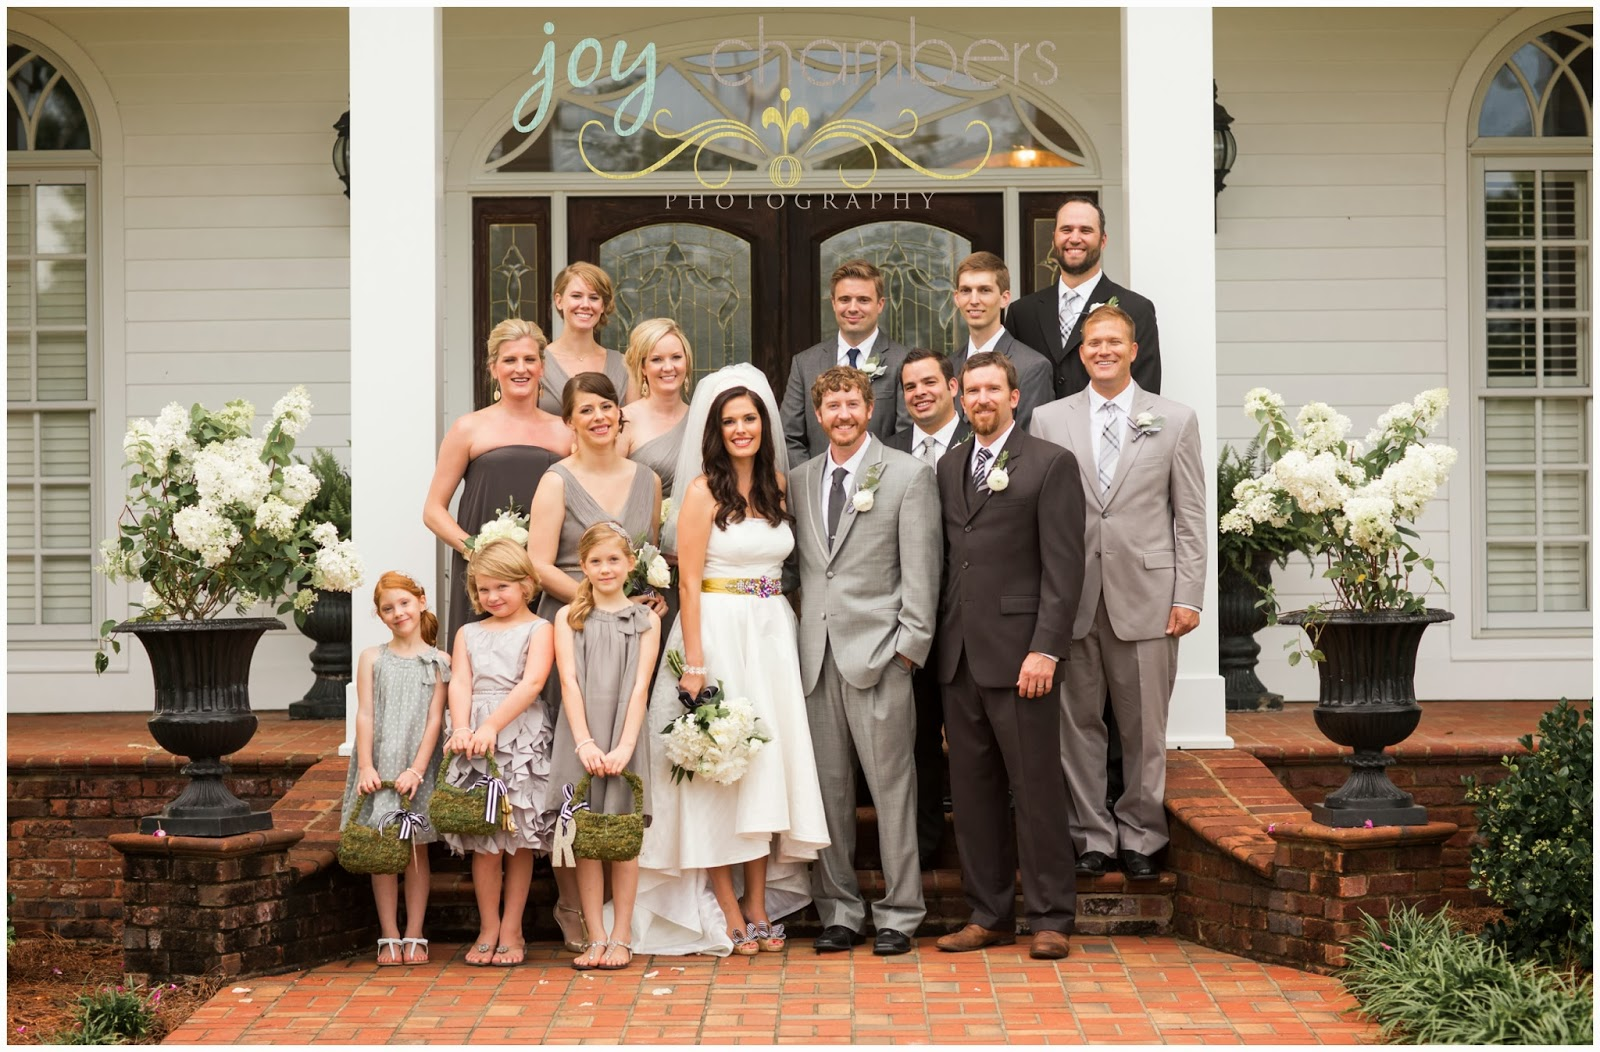 Murfreesboro Wedding Photography: Joy Chambers Photography: Claire & John -A Messick Farm